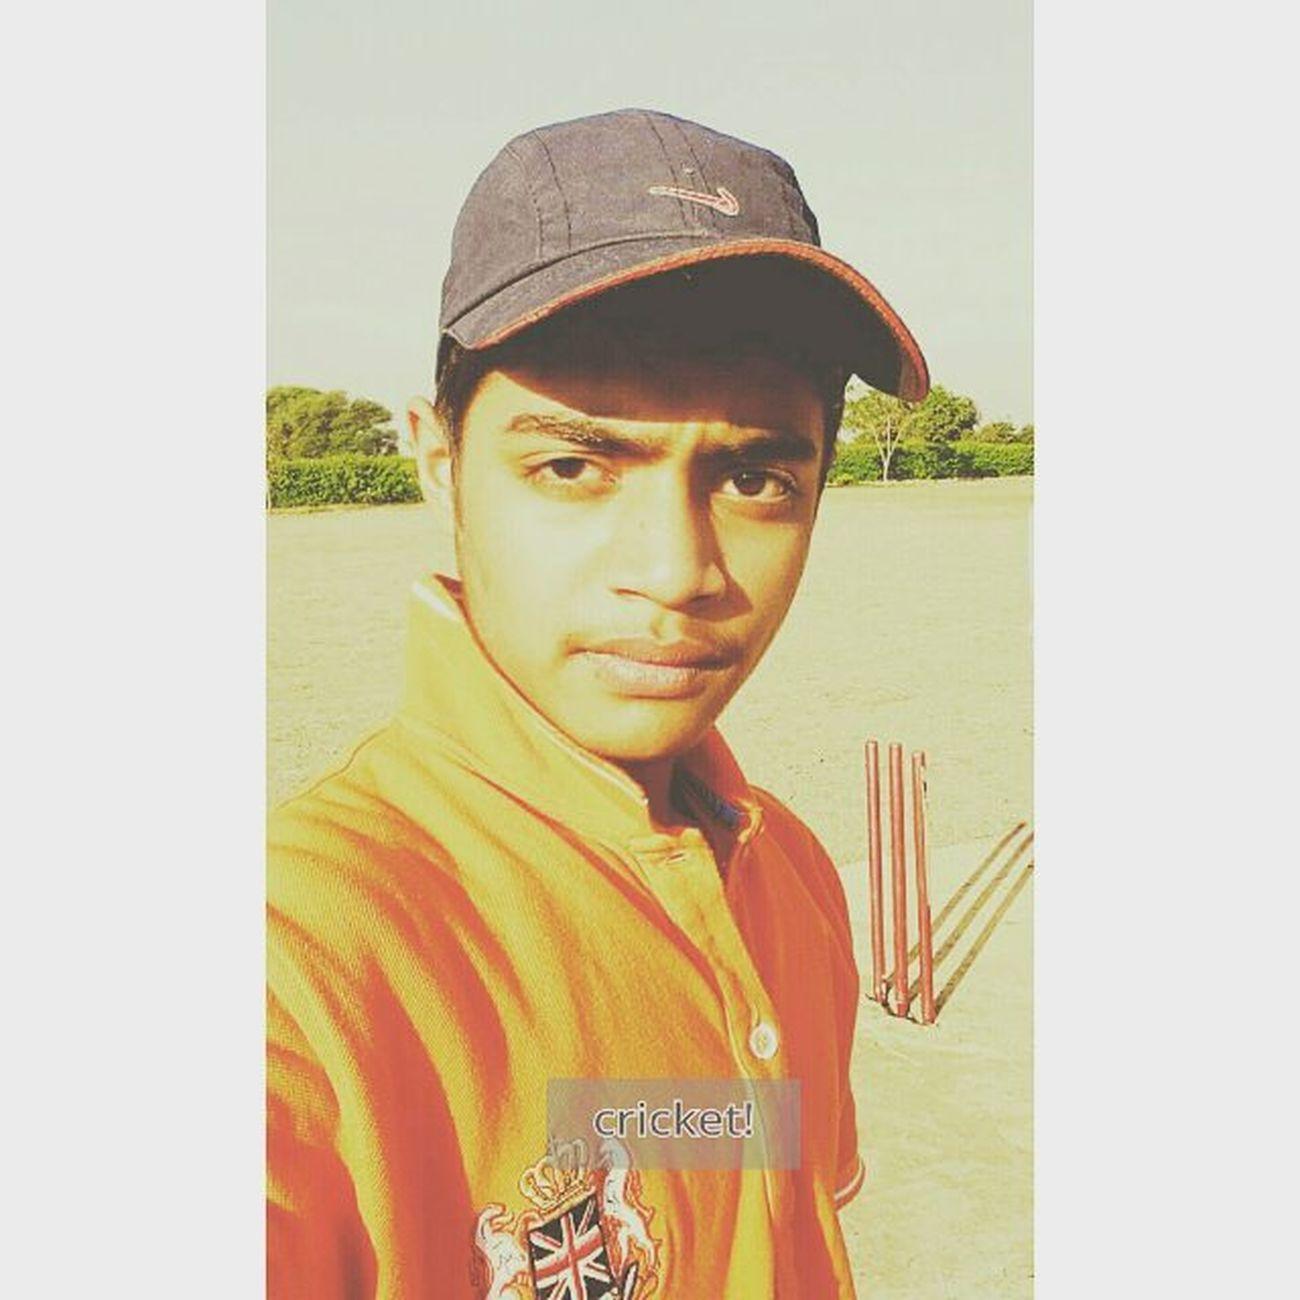 Cricket! Cricket Sometimes Ihatebutilove Daytime Hotwinter Hotwinterday Joyfulday Pics 1 Style Nike Cap Nepolian Orange Lovetoloveit Stumps Crickets Khel Conqure Batsman Fastbowler Wicketkeeper Gentleman  Gentlemanstyle Gentleman